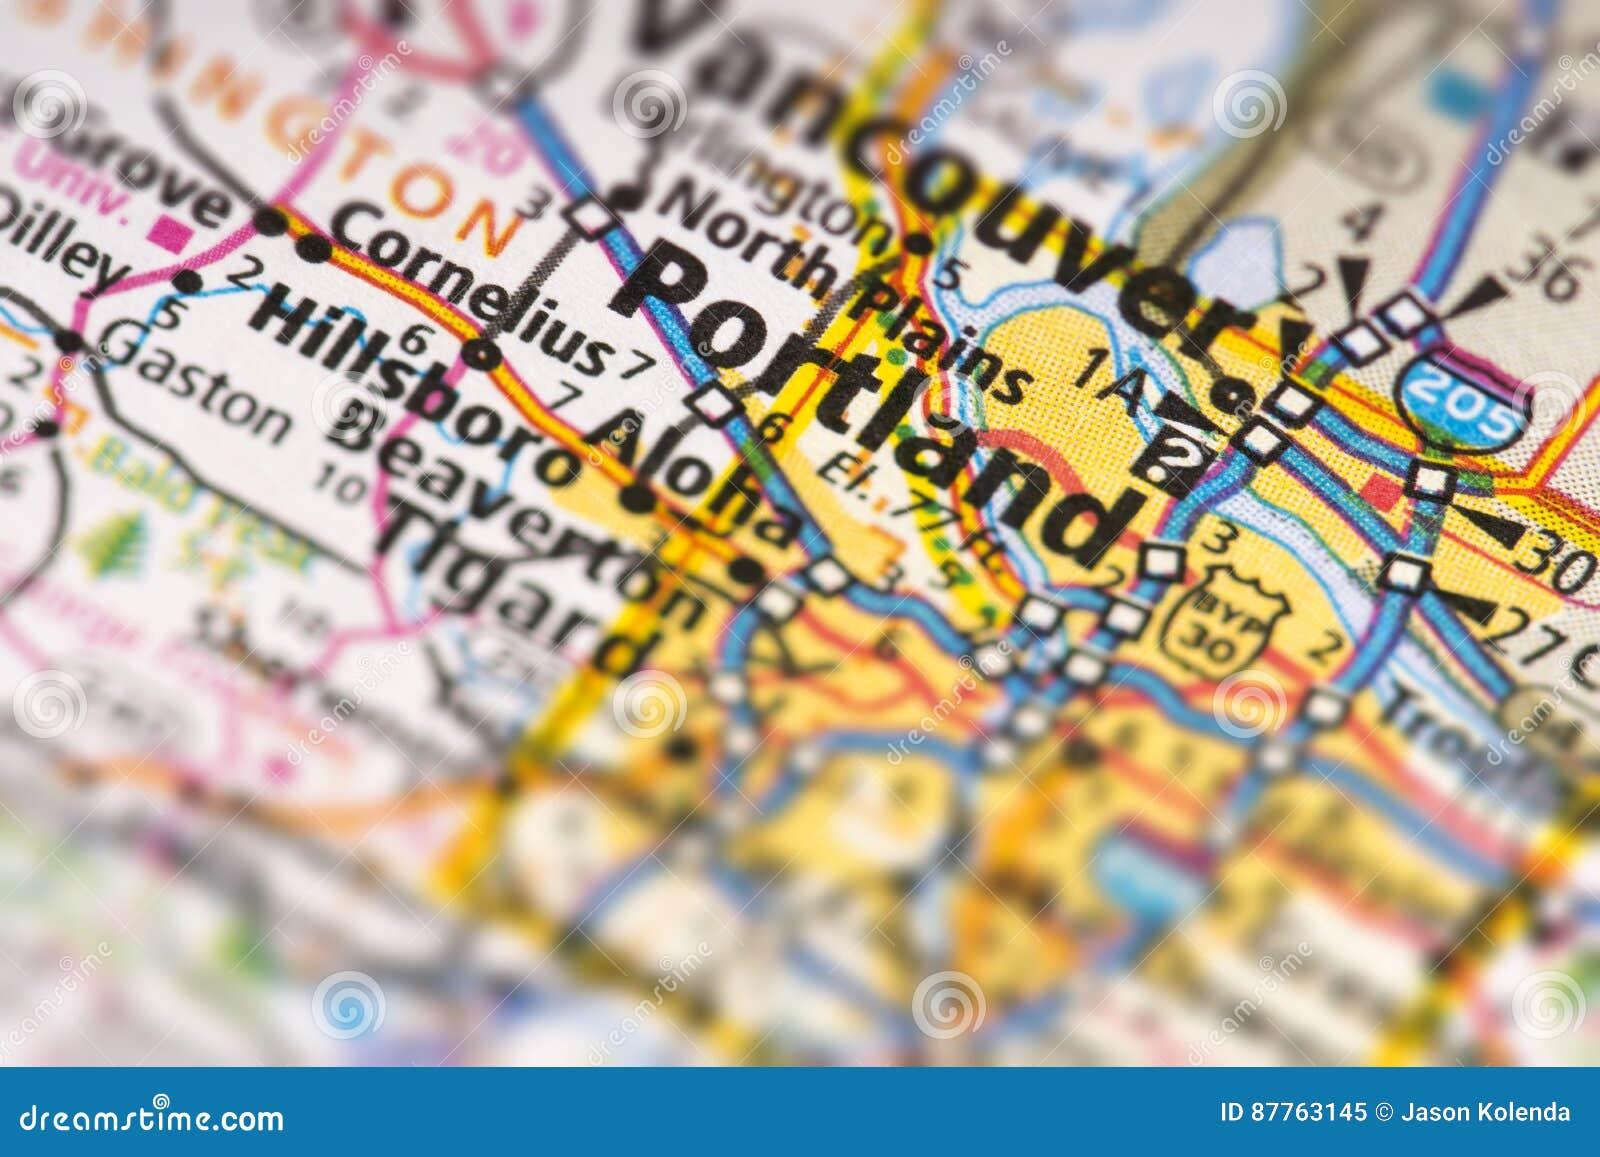 Portland, Oregon on map stock image. Image of closeup - 87763145